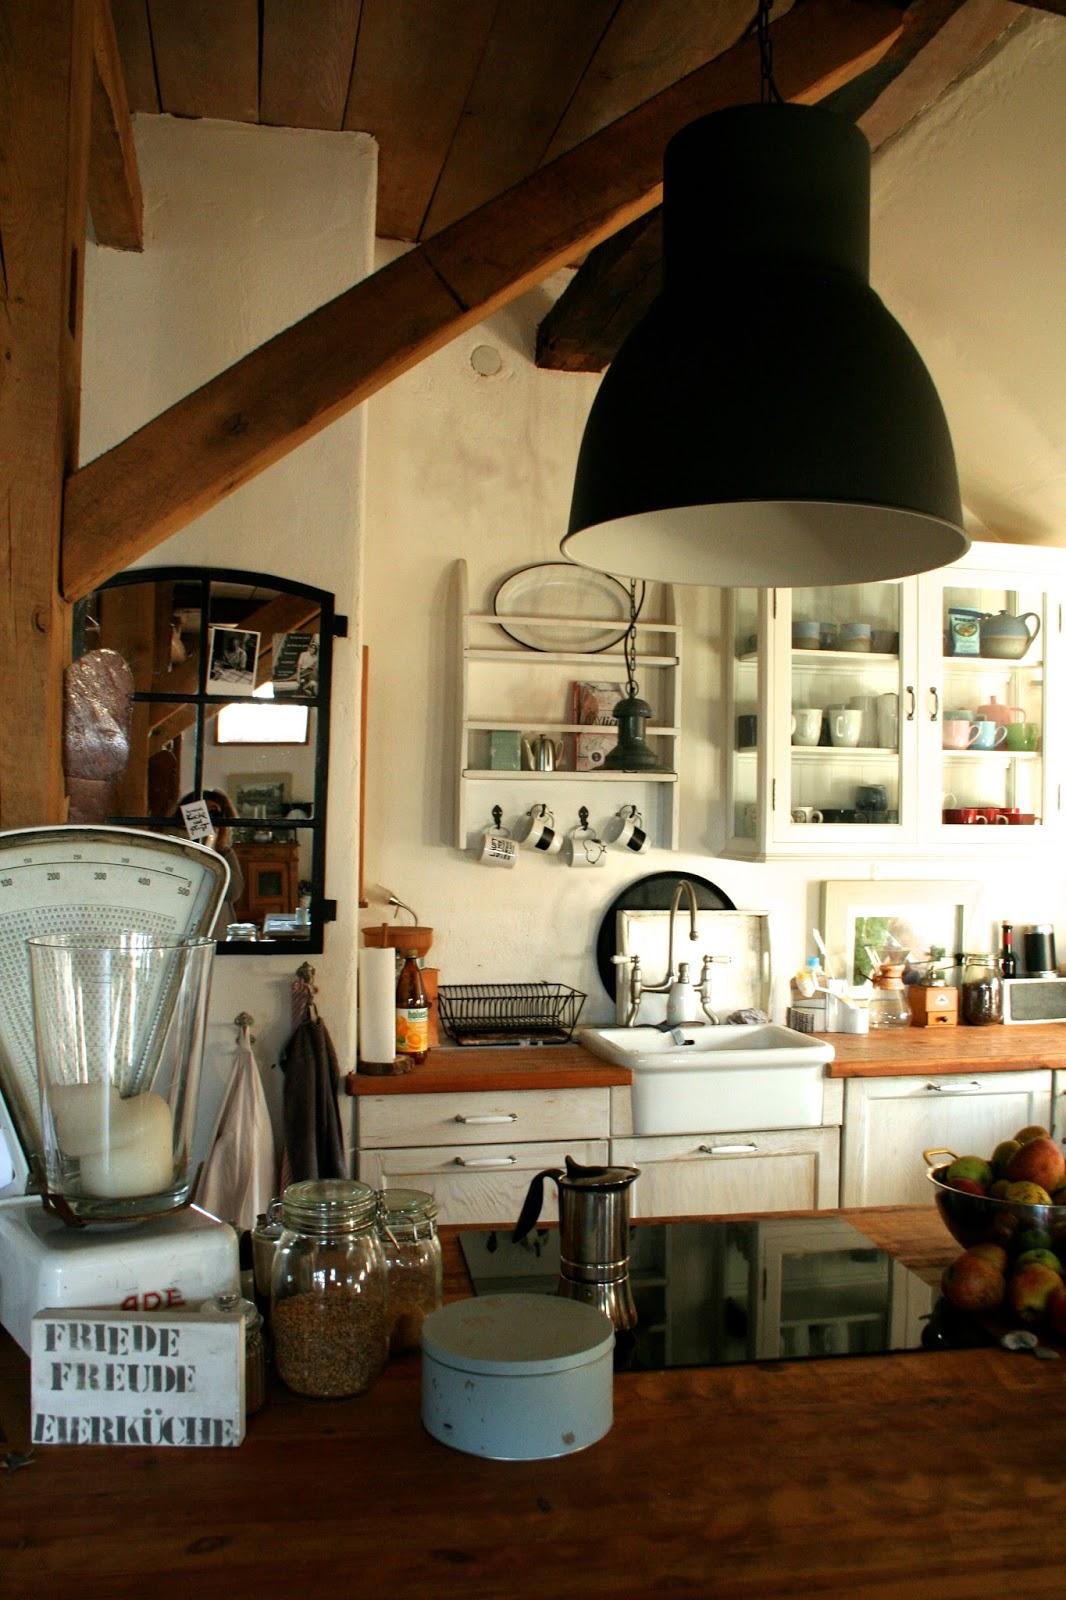 reetselig meine offene k che in unserer alten reetdachkate. Black Bedroom Furniture Sets. Home Design Ideas